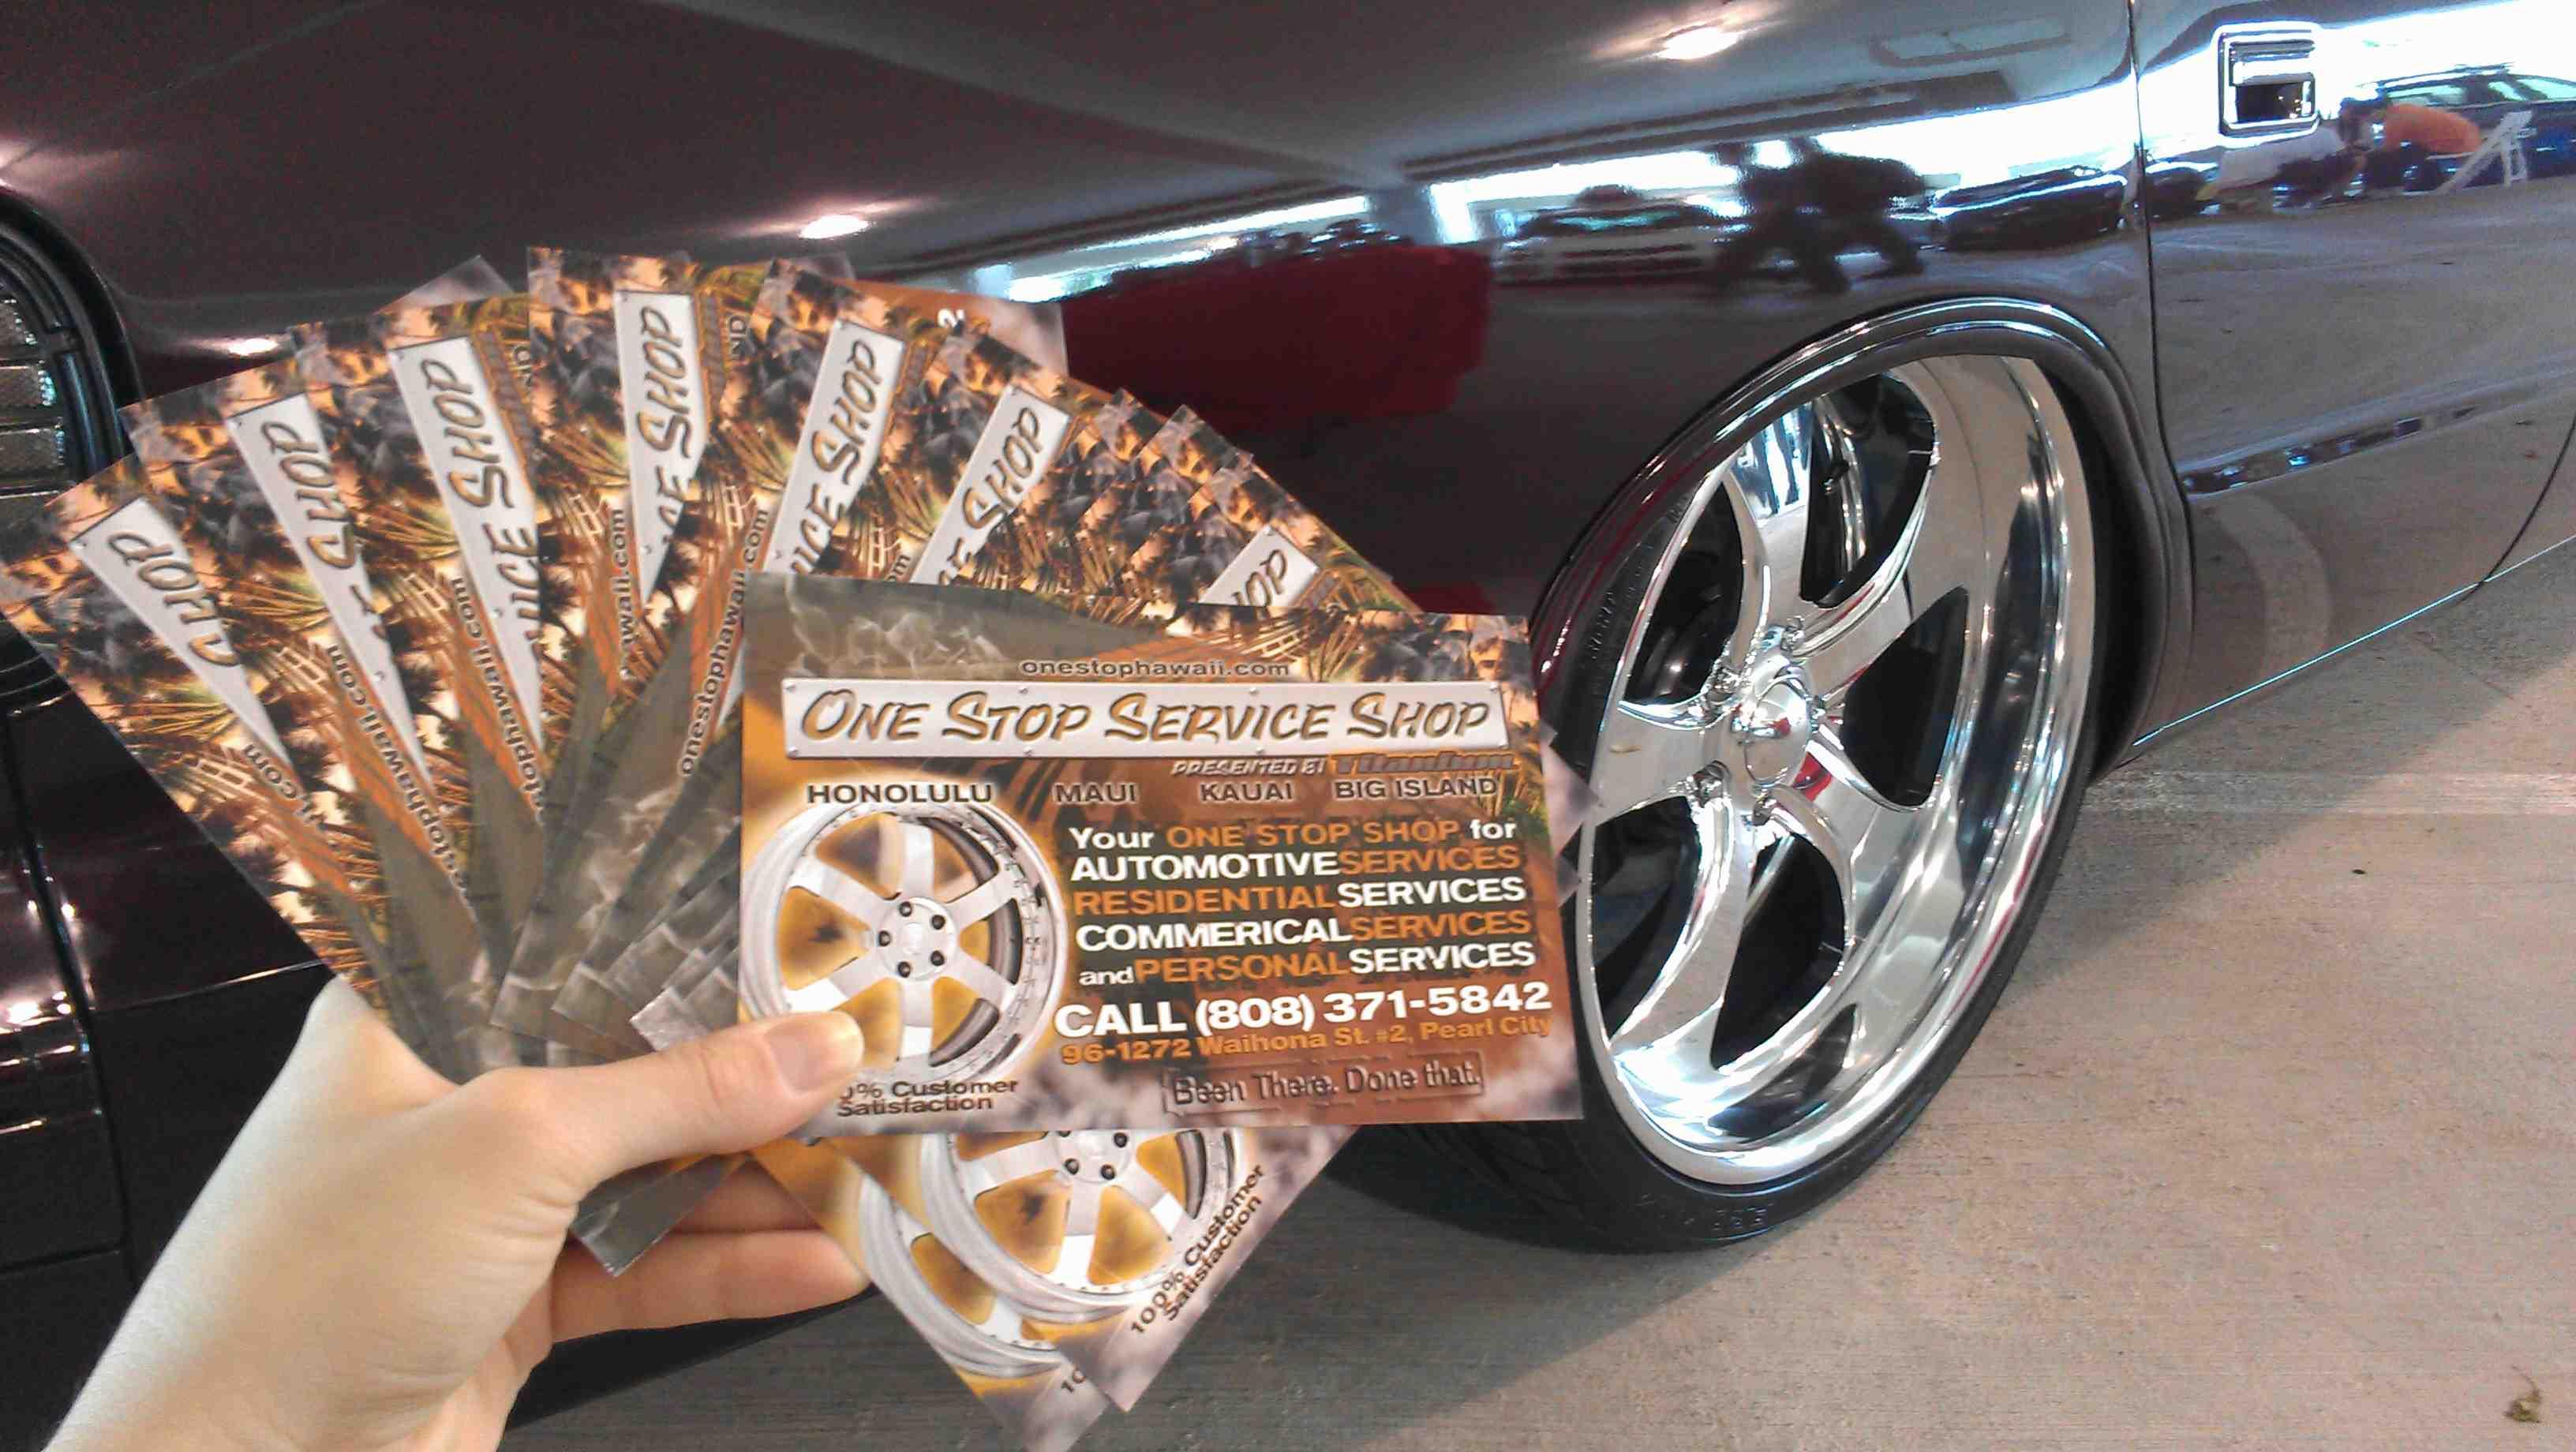 One Stop Titanium In Hawaii Rim Repair Automotive Personal